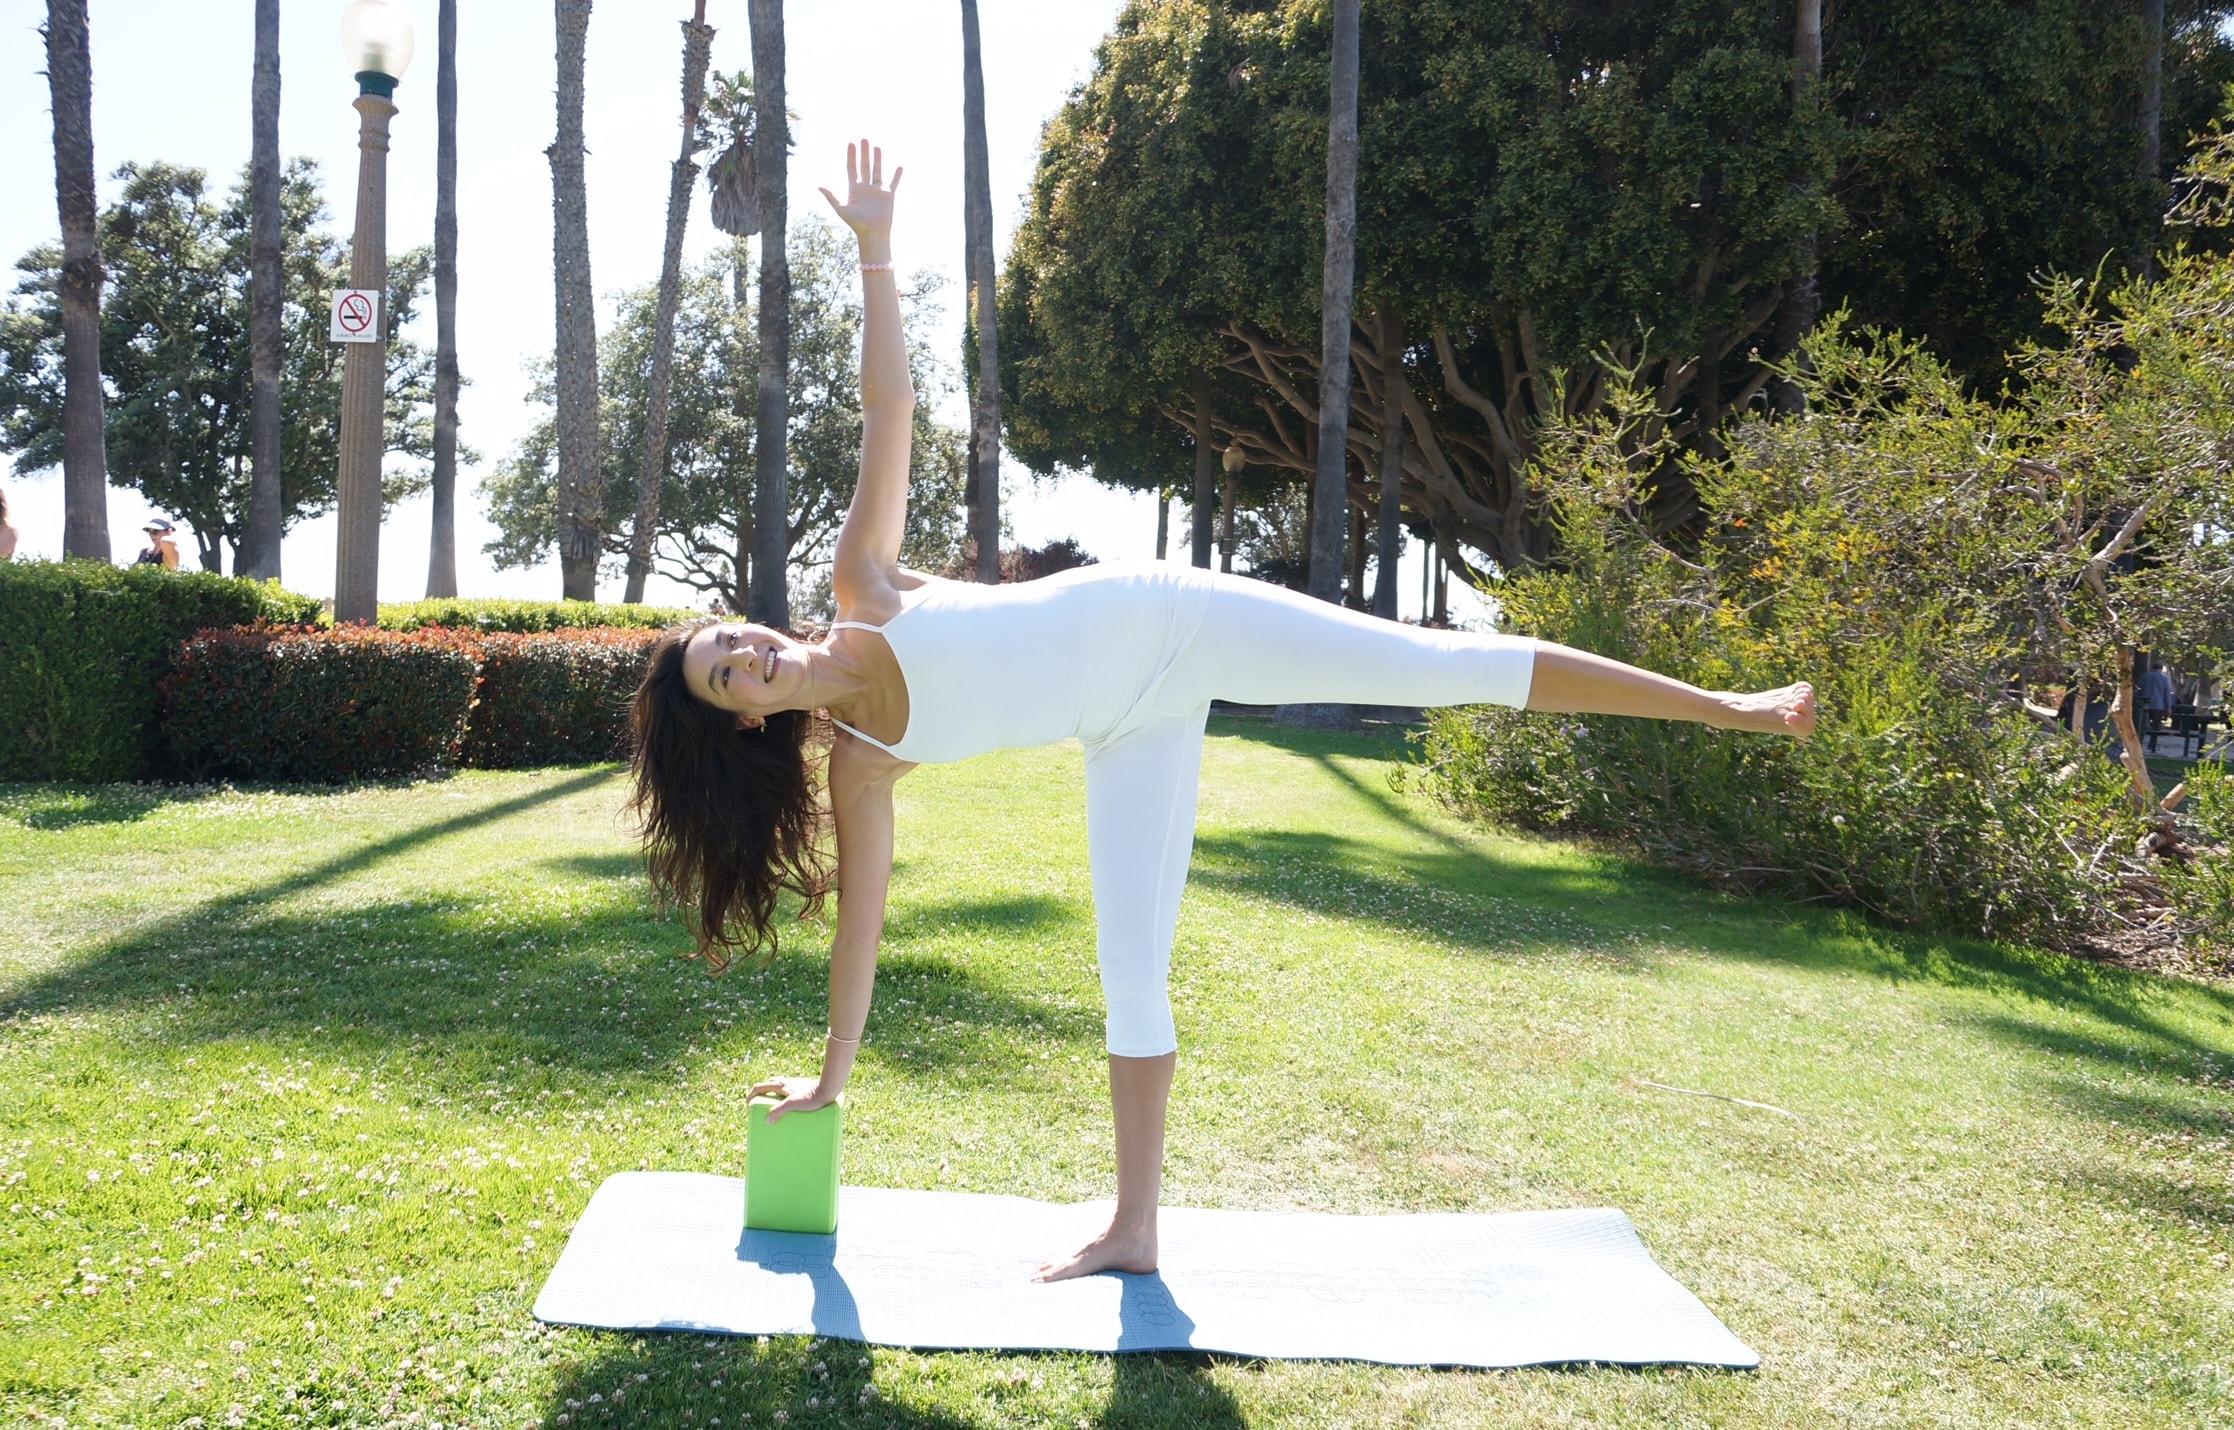 Private Yoga Instructor Santa Monica Los Angeles Using Yoga Blocks